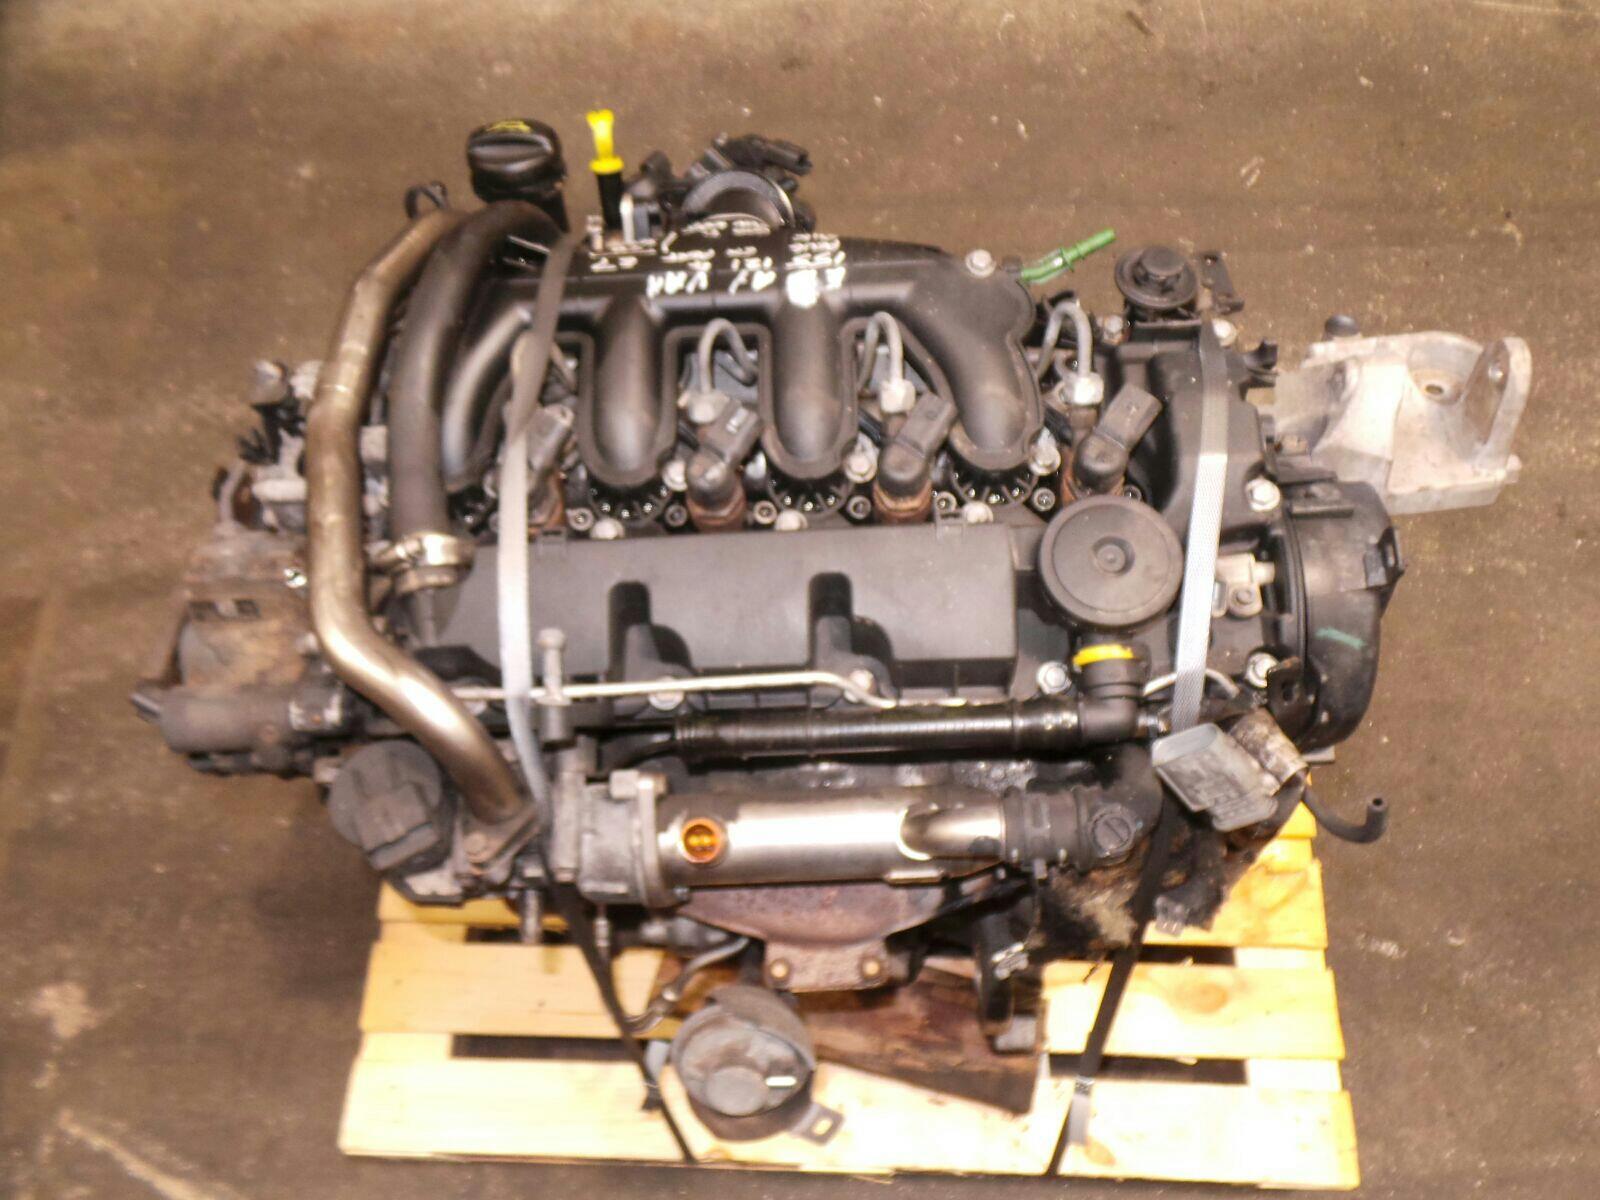 peugeot expert tepee 2007 on engine diesel manual for sale from rh motorhog co uk Engine Data Sheet Rhk Recovery